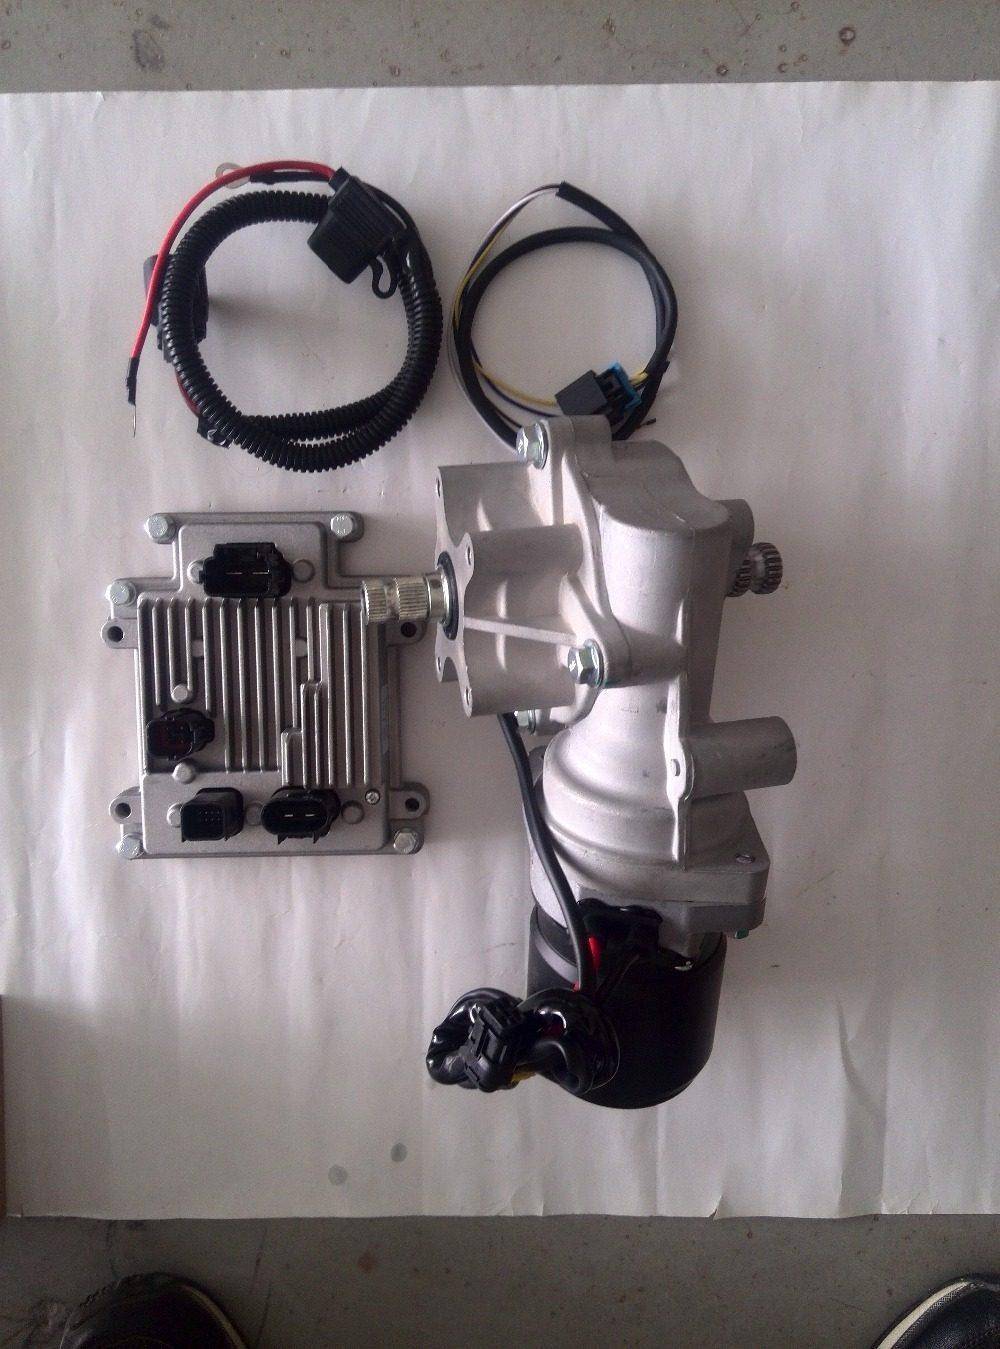 Online Shop Sj410 Carburetor For Suzuki 13200 80322 80321 4af Wiring Harness Utv 380w Electric Power Steering Of Universal Parts Eps Ecu